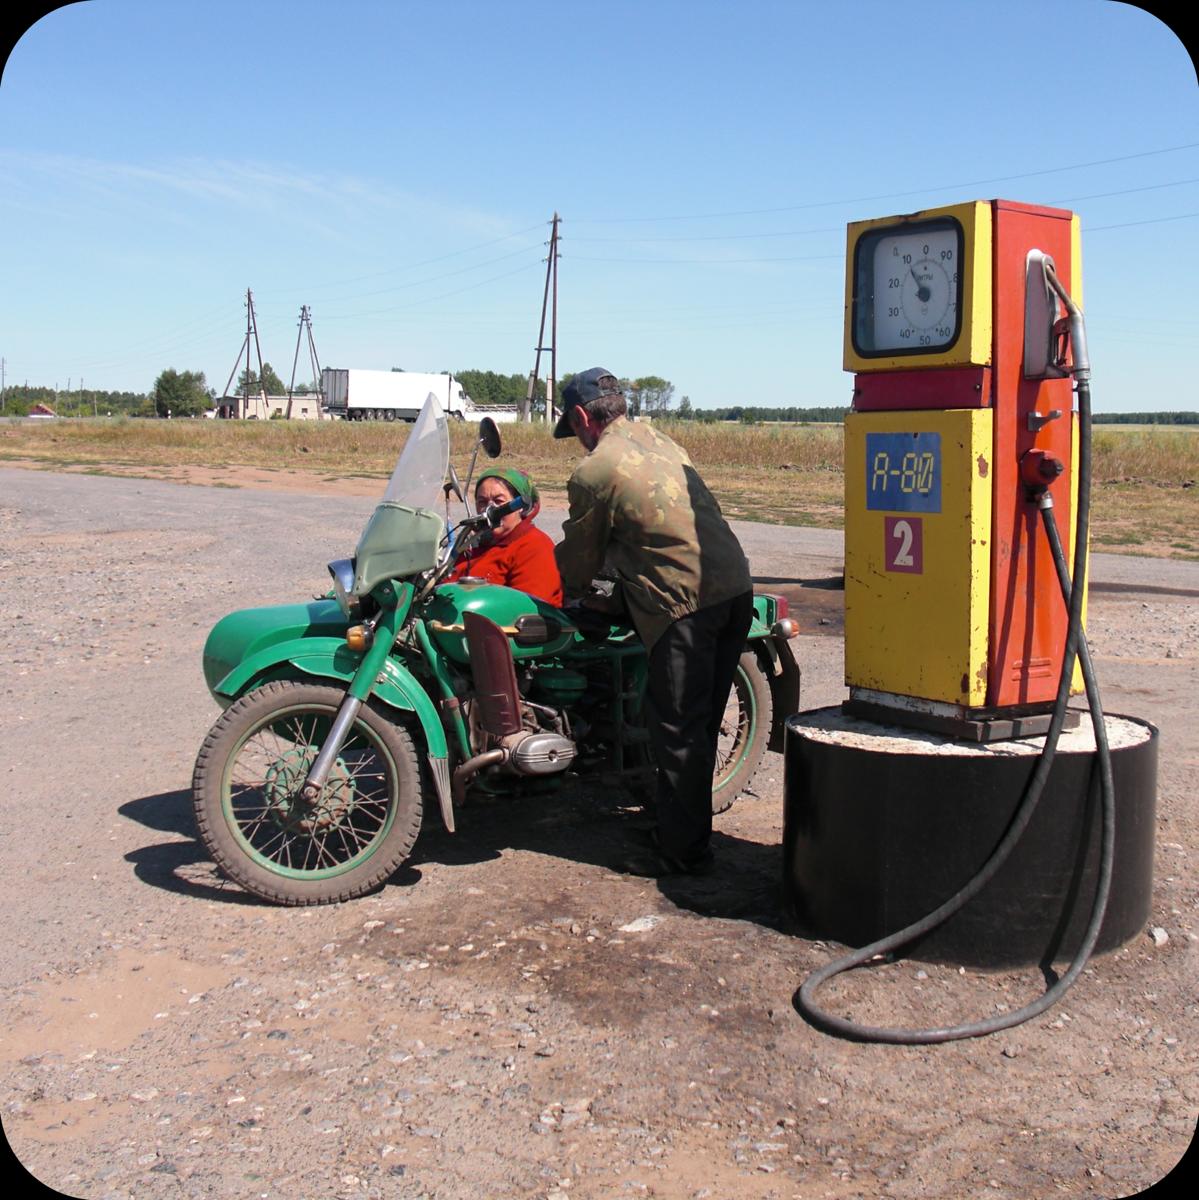 #uralmotorcycle #gasstation